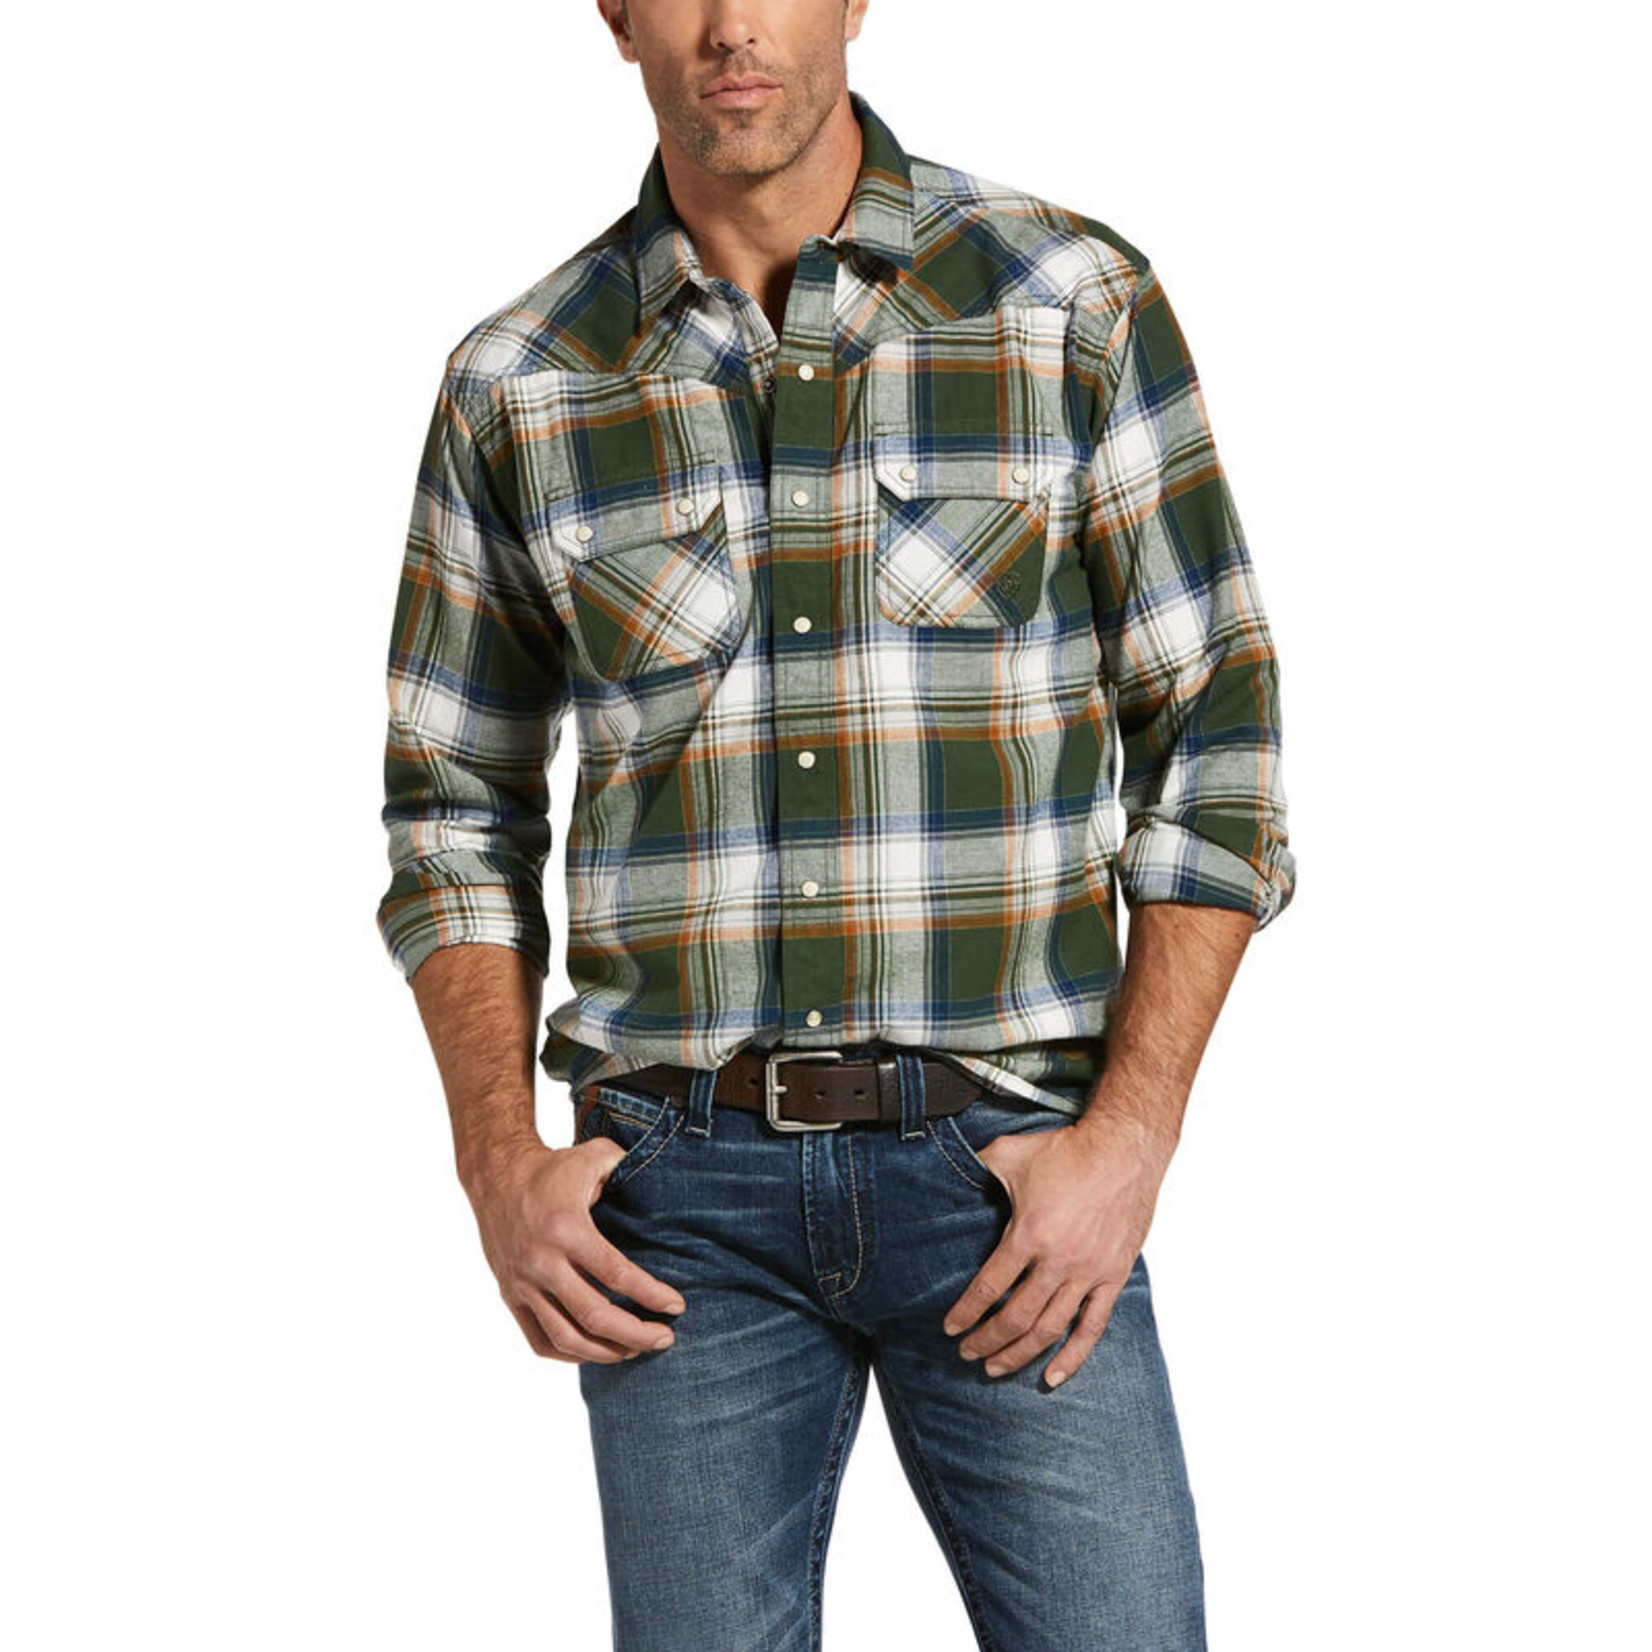 Ariat Men's Ariat Hacienda Retro Fit Shirt Duffel Green 10032891